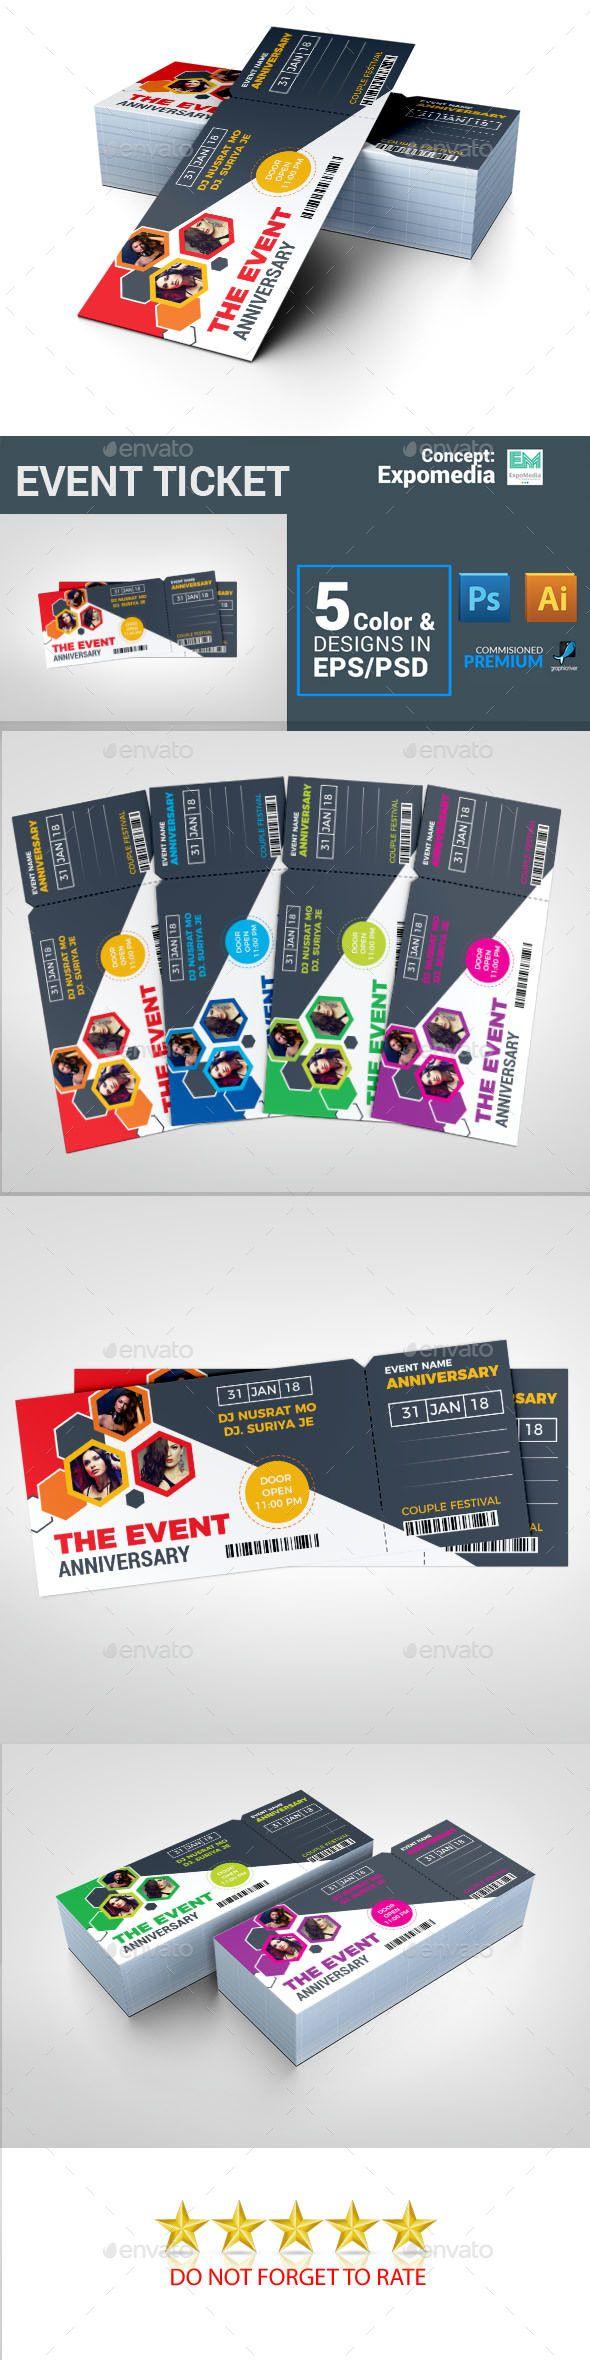 Event Ticket Template PSD, Vector EPS, AI Illustrator